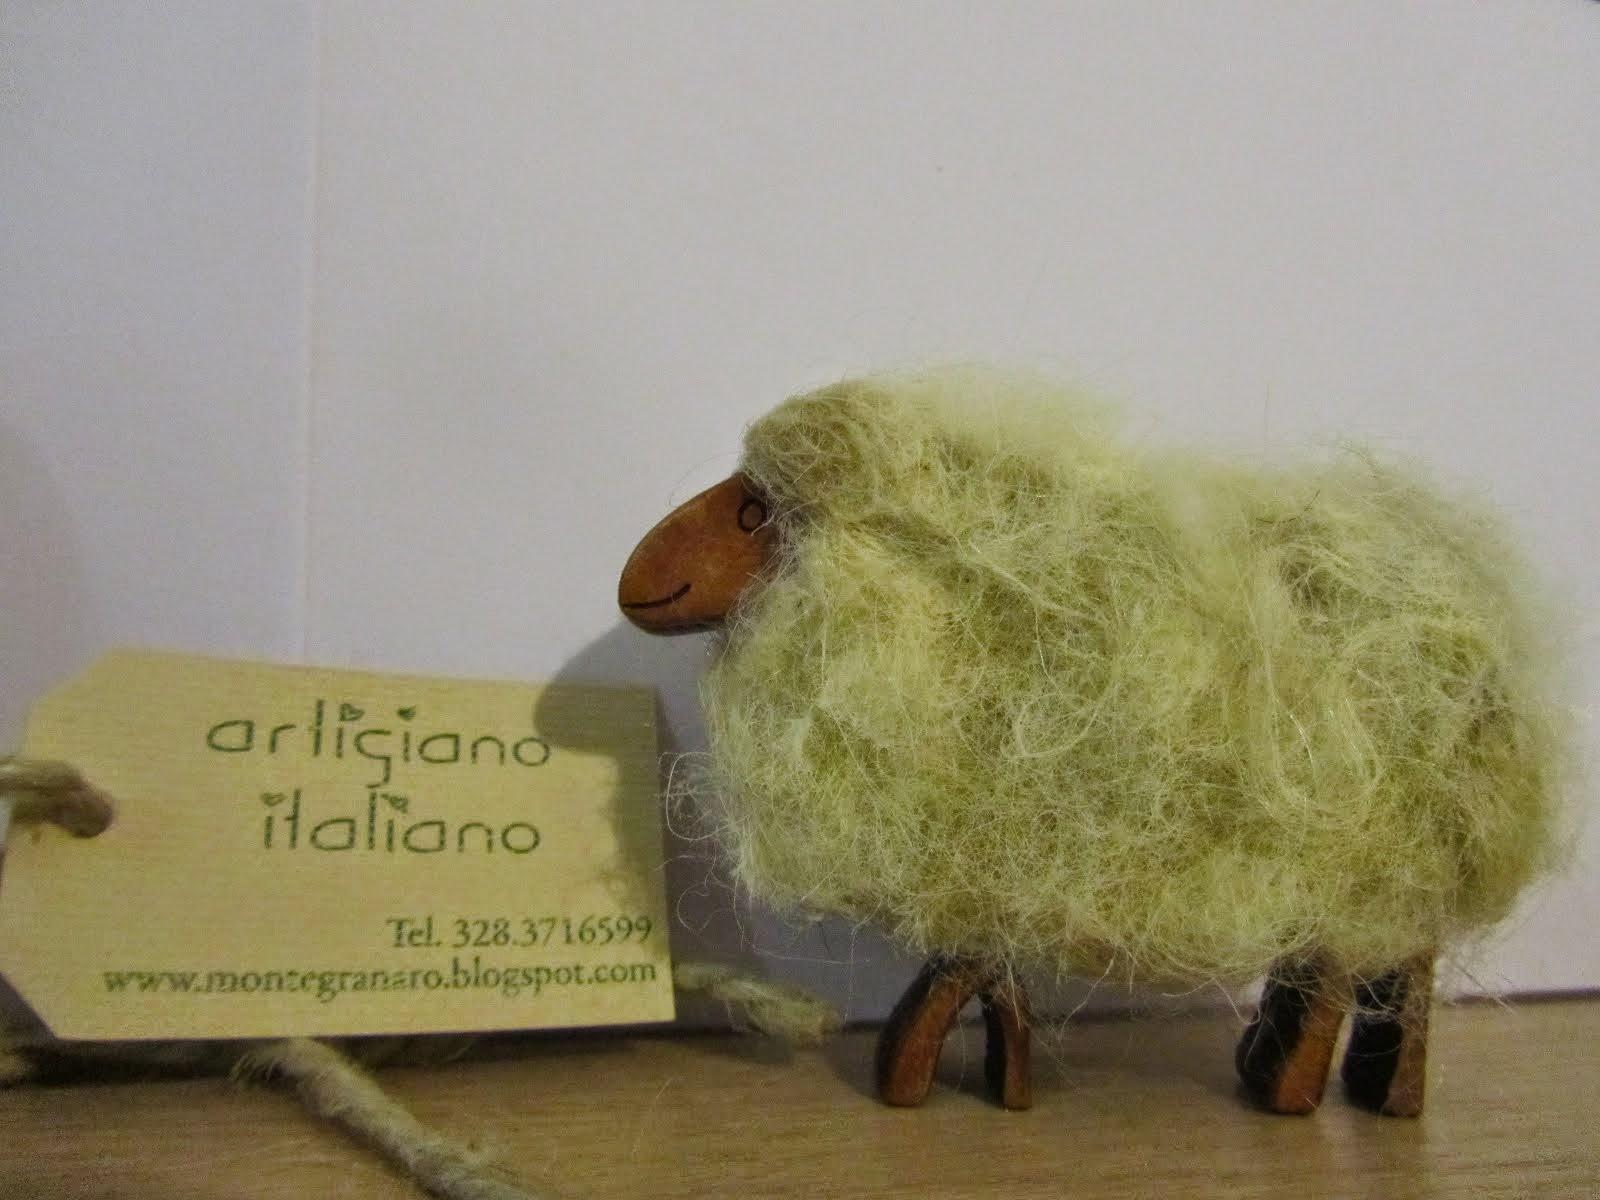 Pecorelle artigianali per presepe